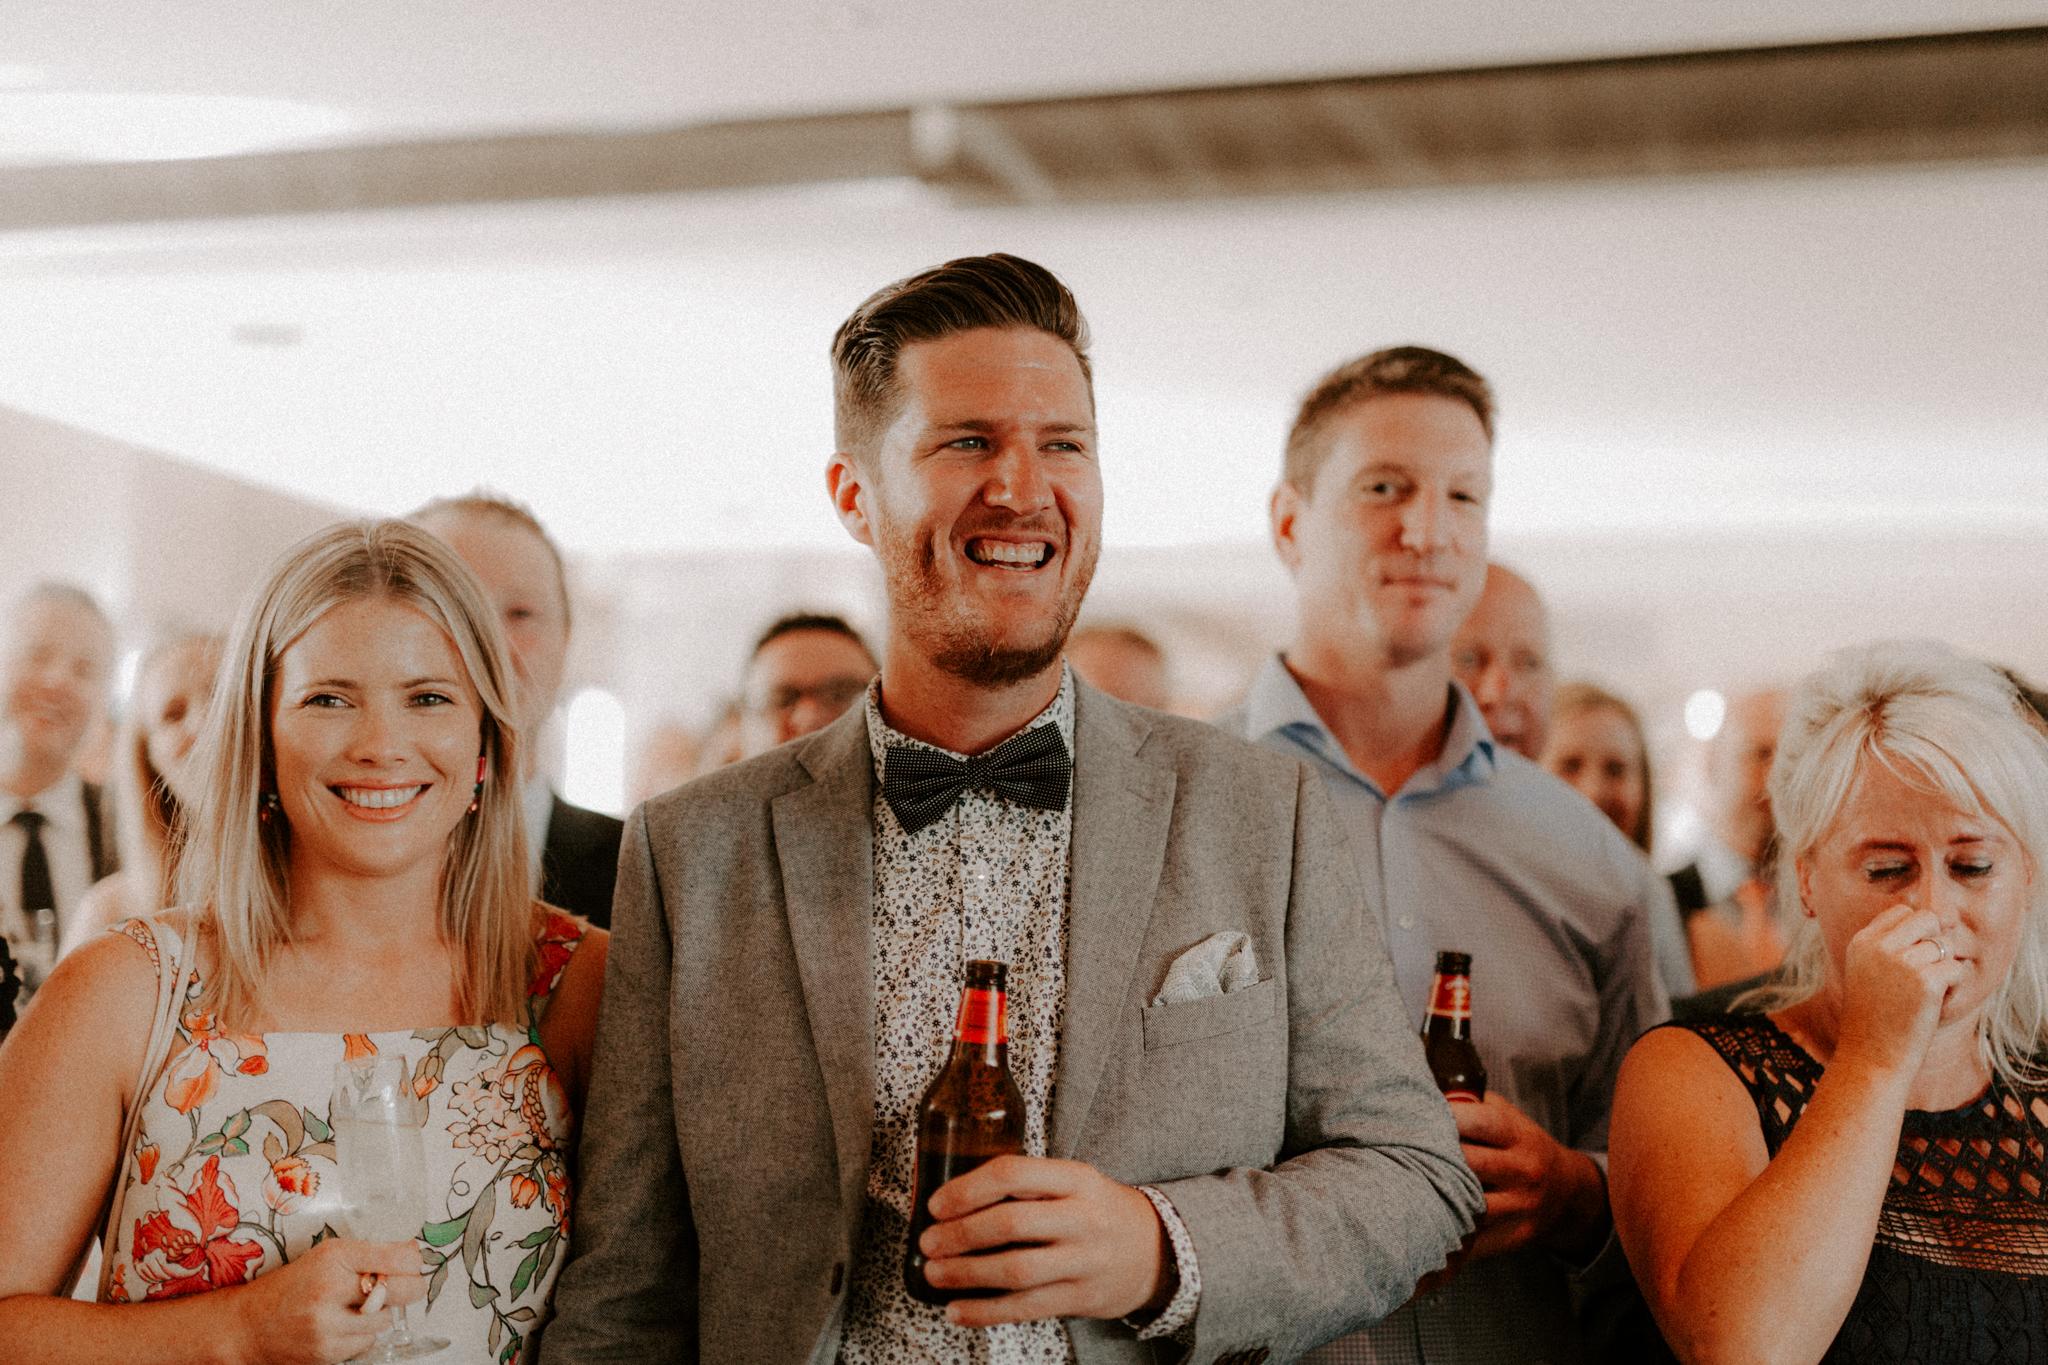 St-Kilda-Garden-Wedding-Emotions-and-Math-Photograph-197.jpg